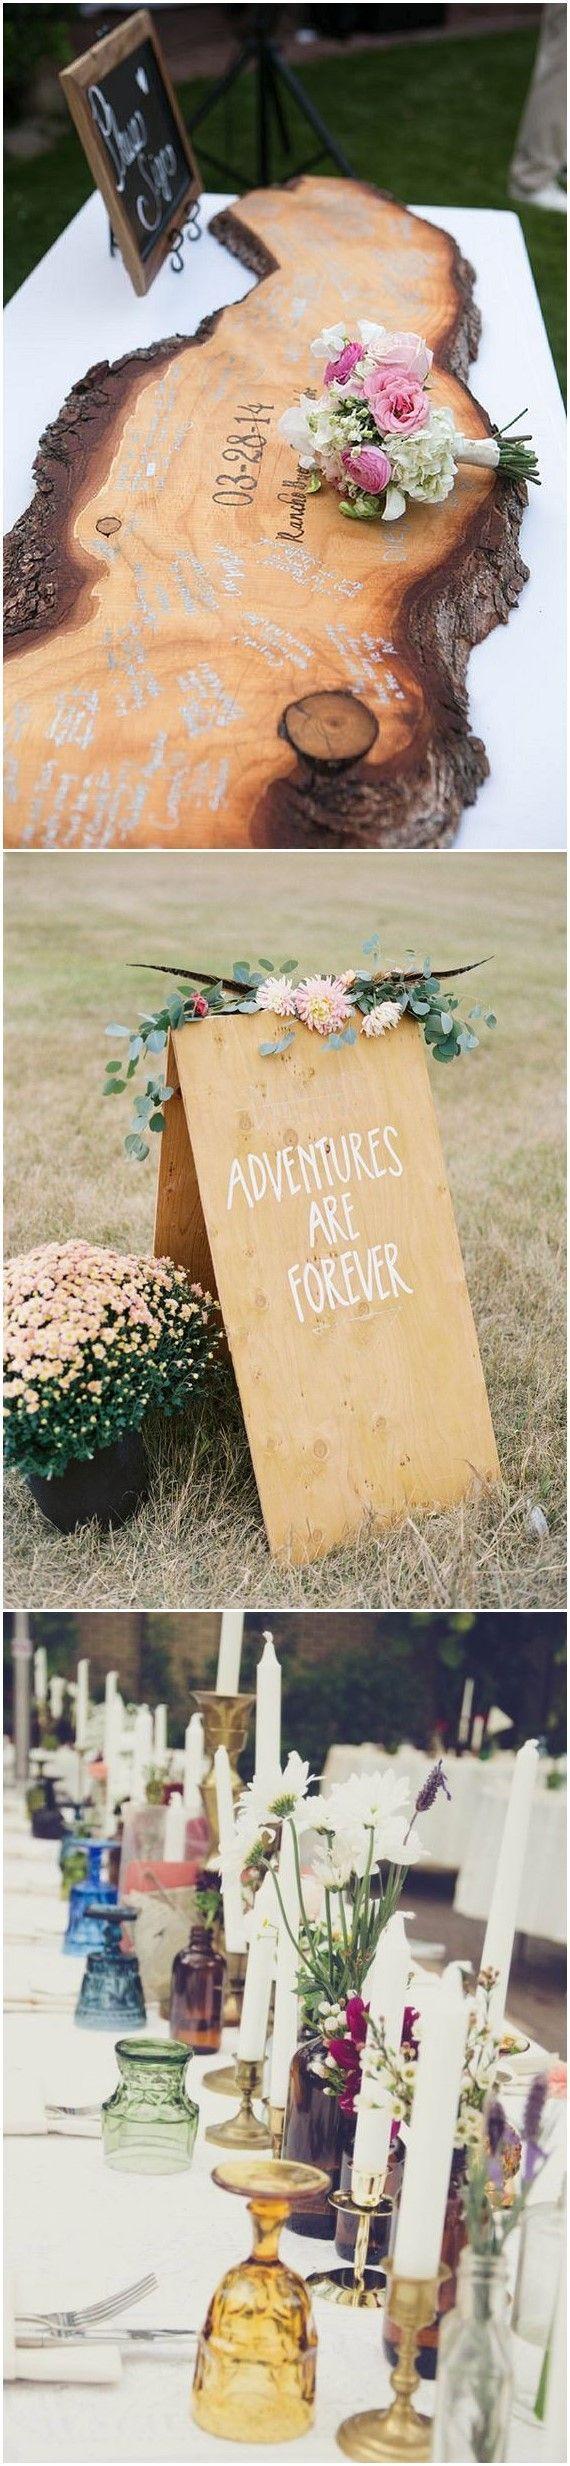 best our wedding images on pinterest wedding ideas wedding